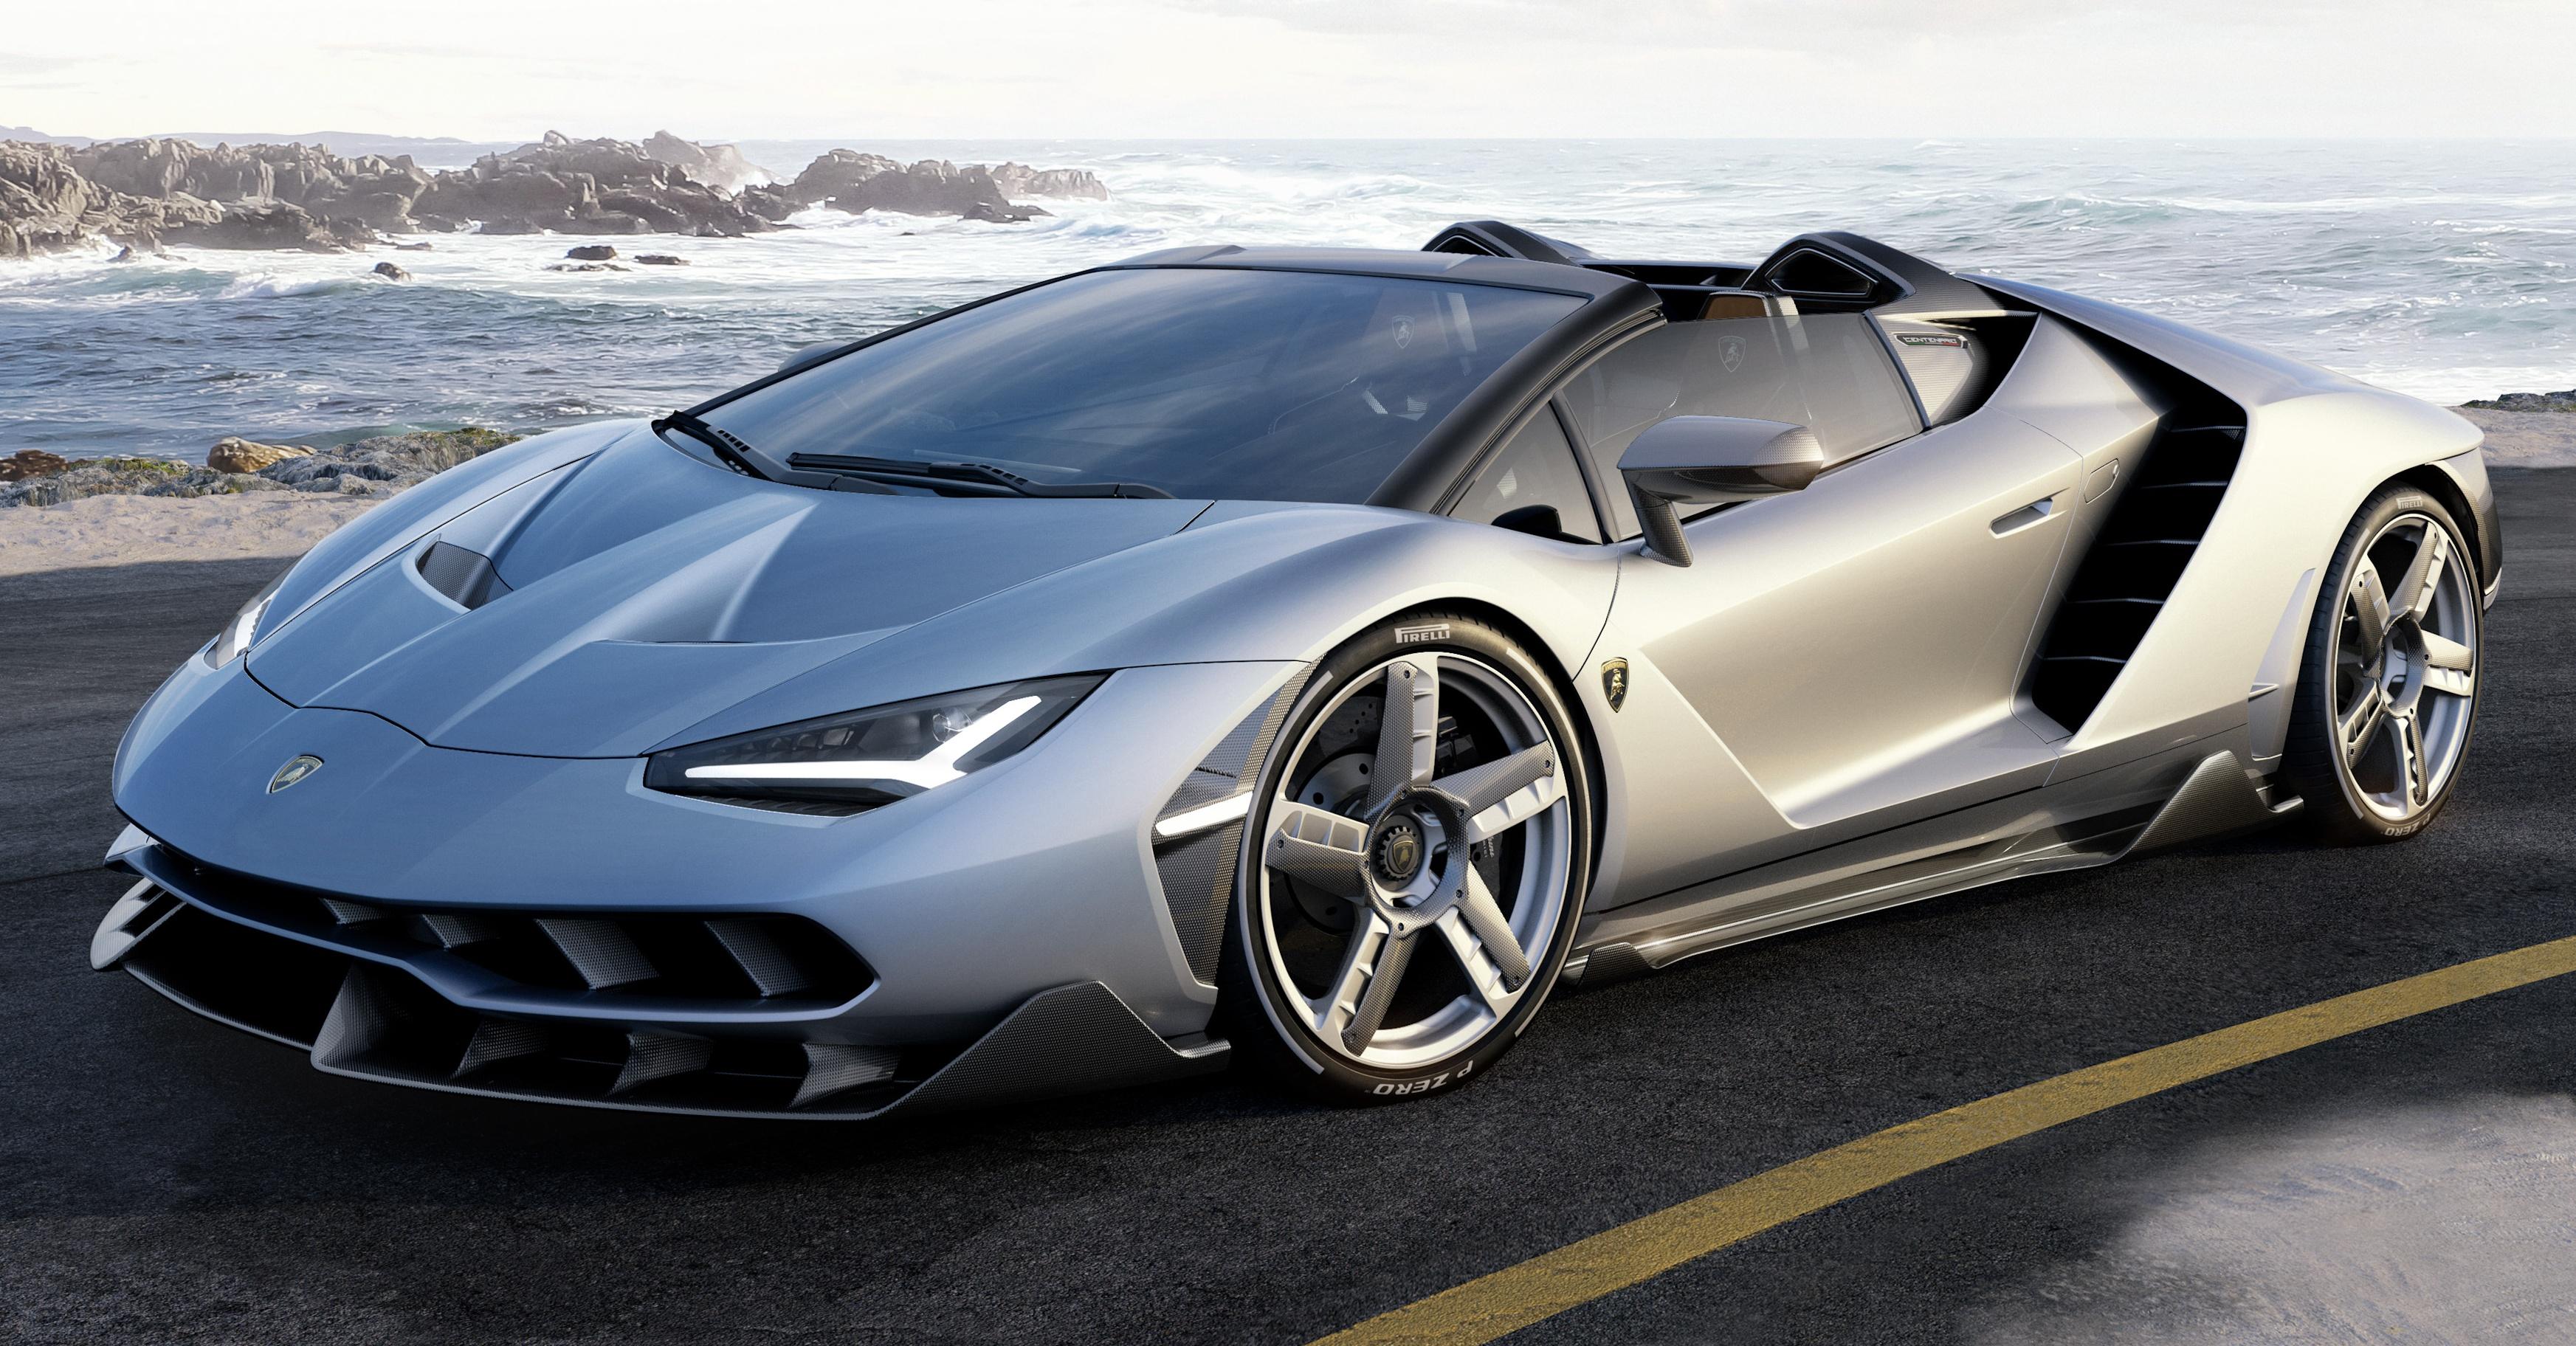 http://s1.paultan.org/image/2016/08/Lamborghini-Centenario-Roadster-3-e1471831821902-1.jpg